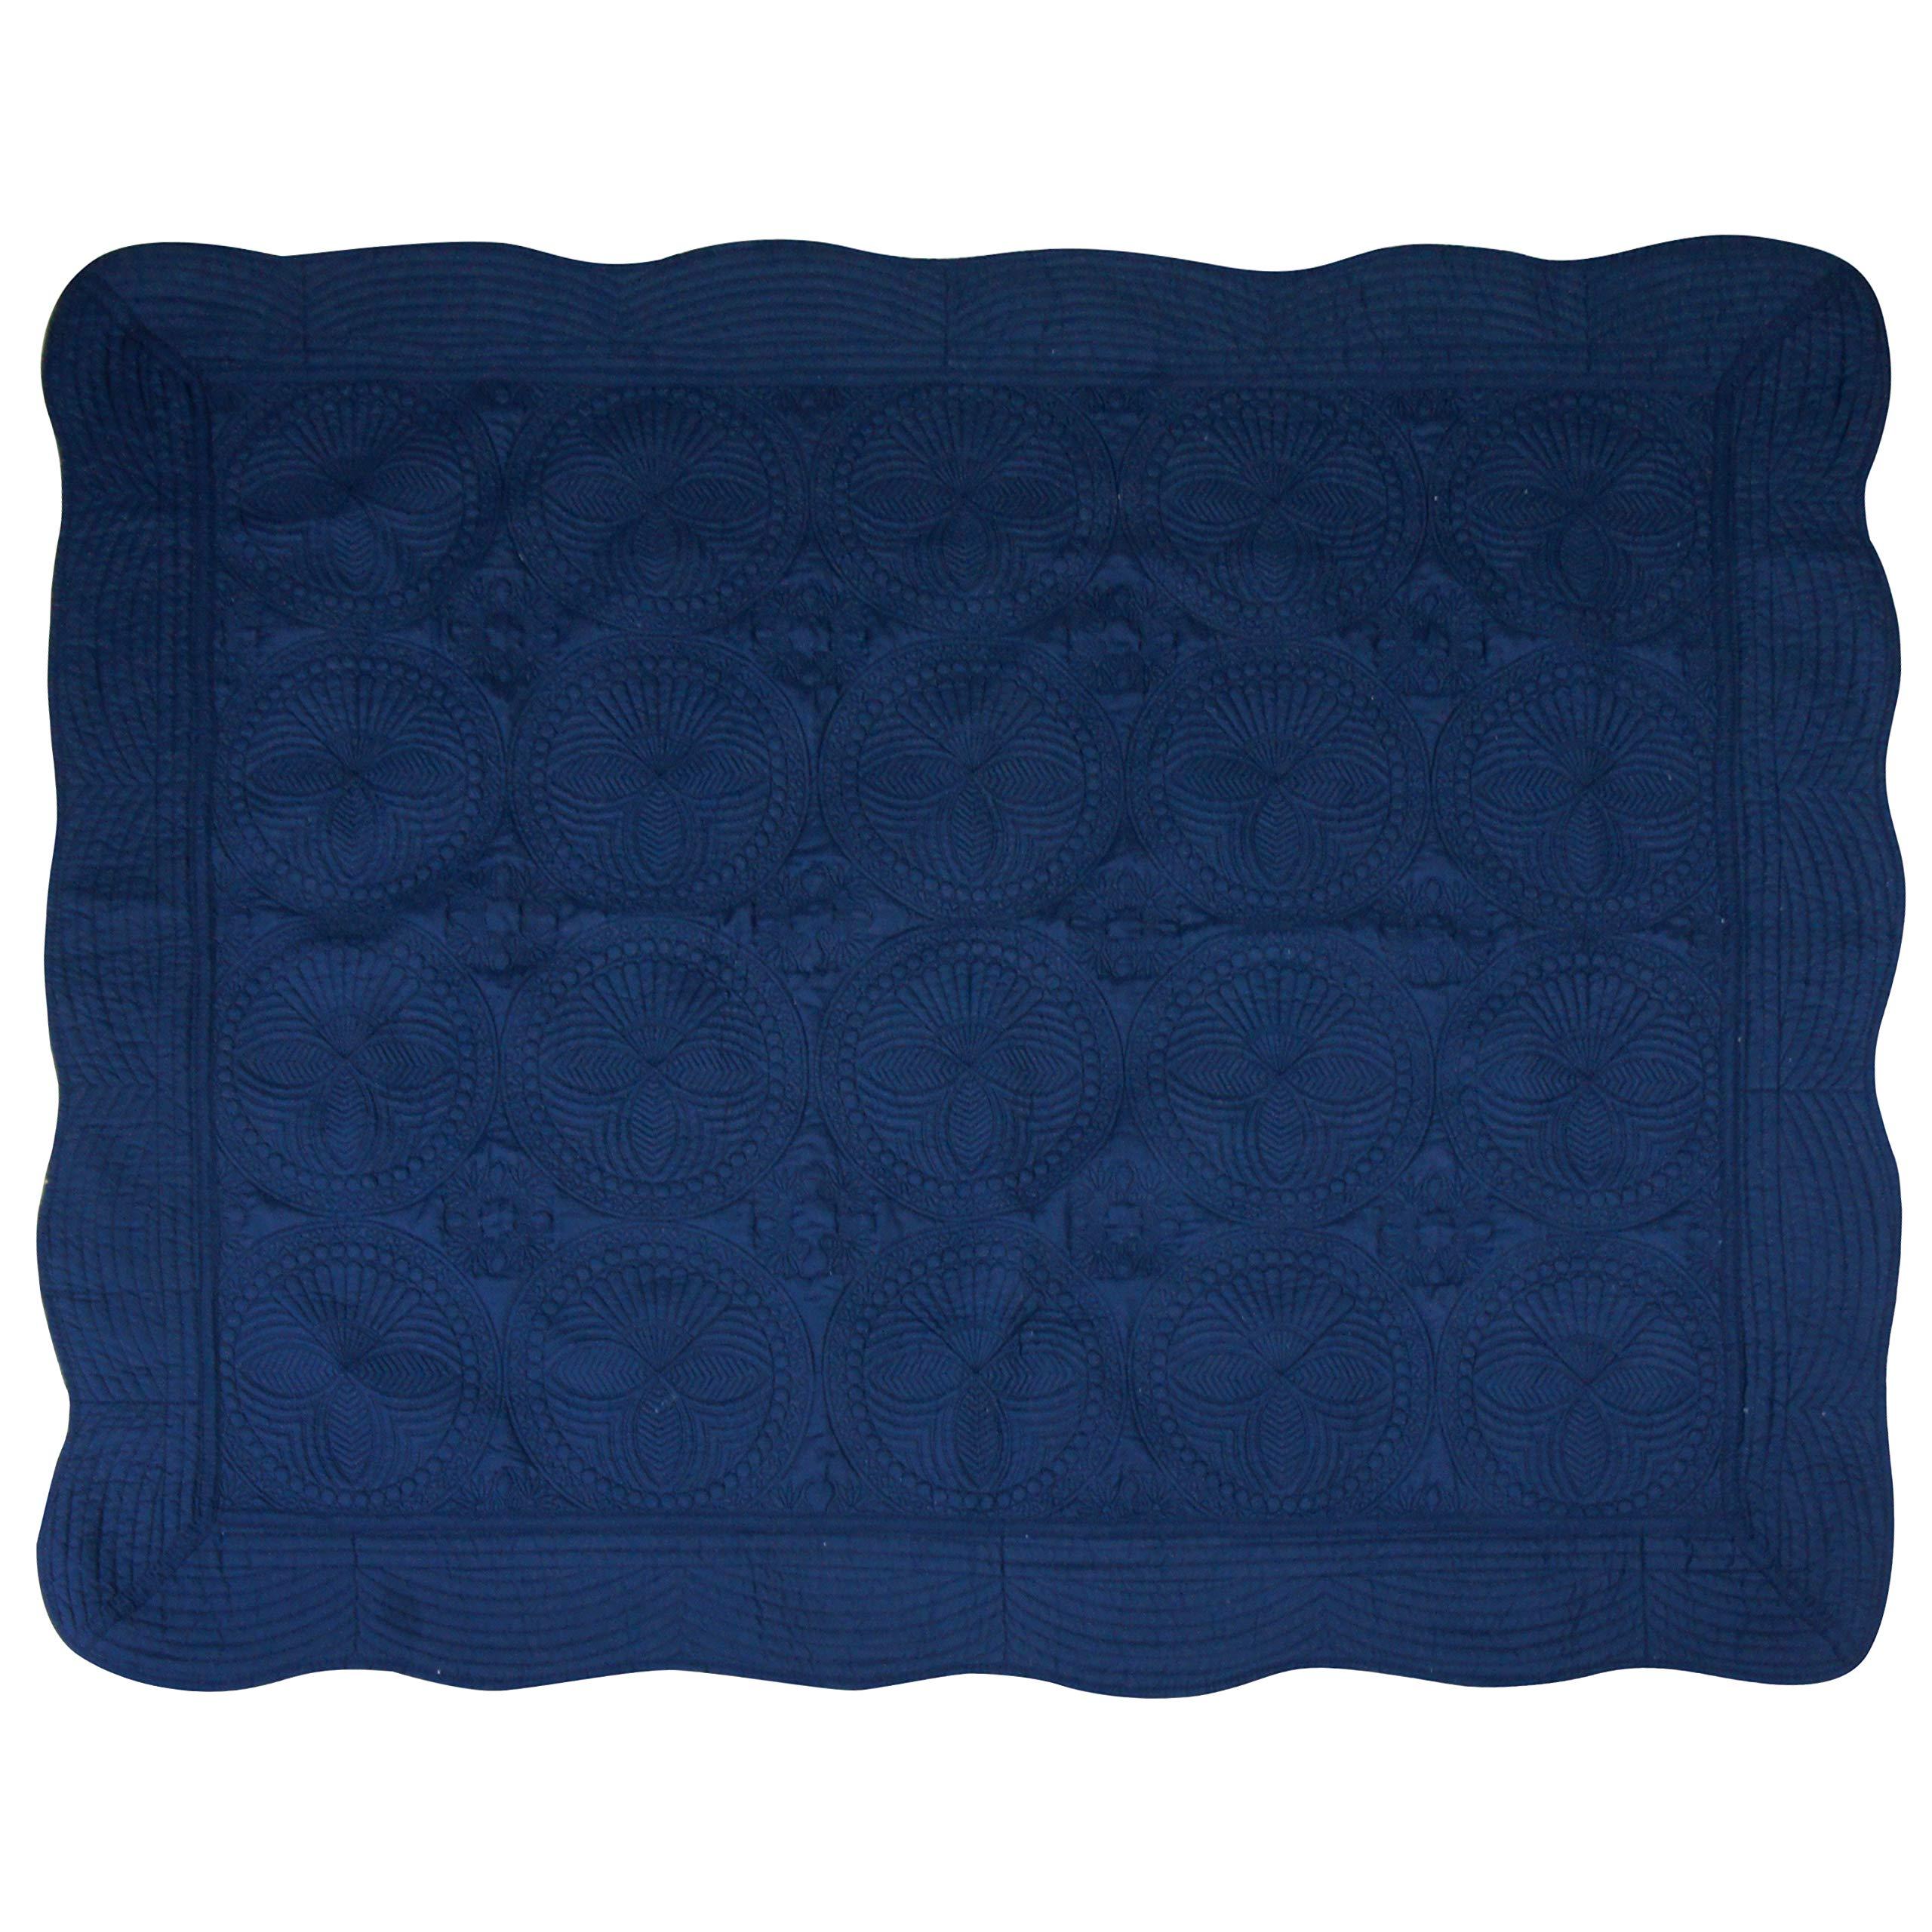 USTIDE Baby Personlized Quilt Monogram lightweight Blanket Embossed Cotton Quilt four Seasons,50''x60''Newborn Baby Boy/girl Gift (Navy Blue)